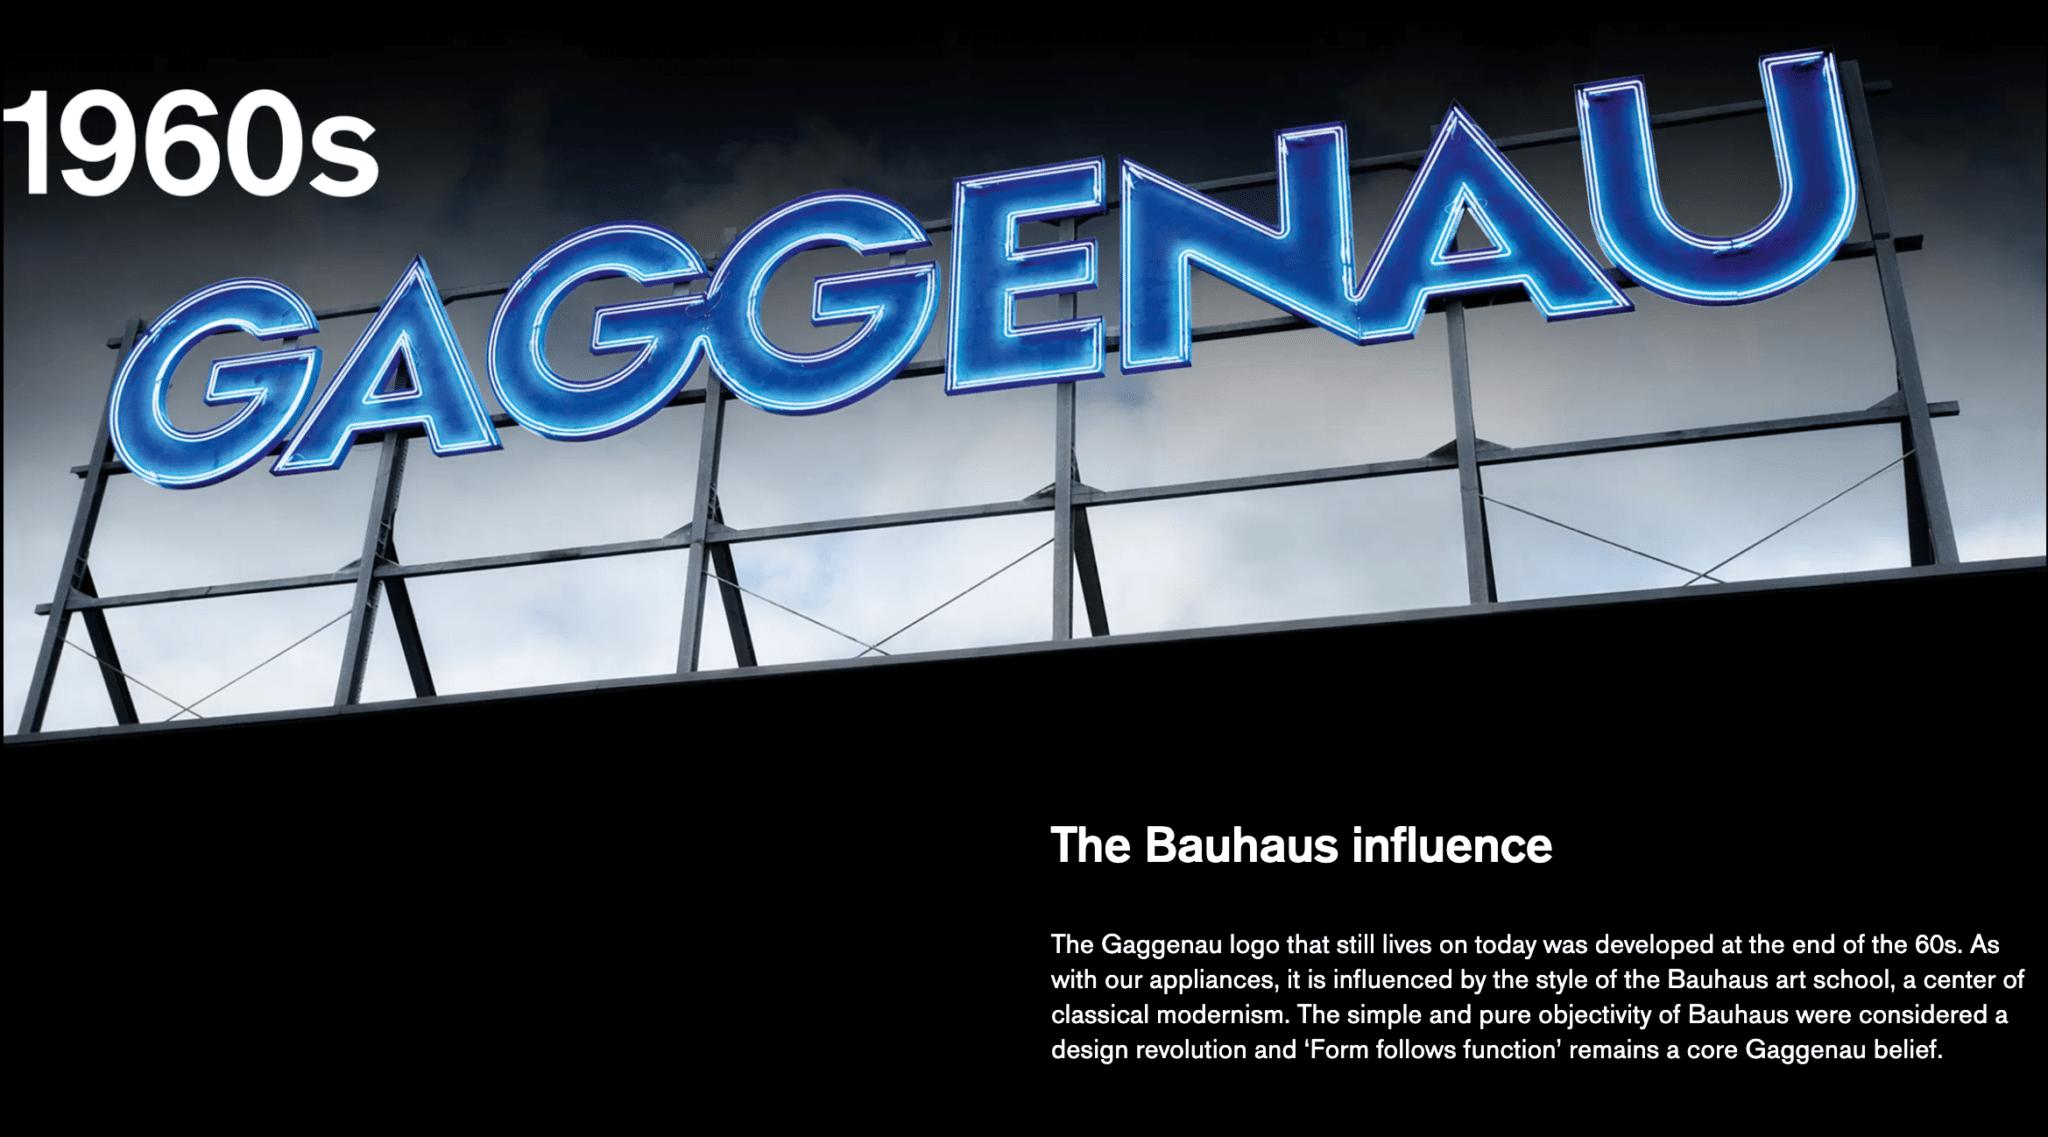 Gaggenau 2021-01-03 at 12.26.52 PM